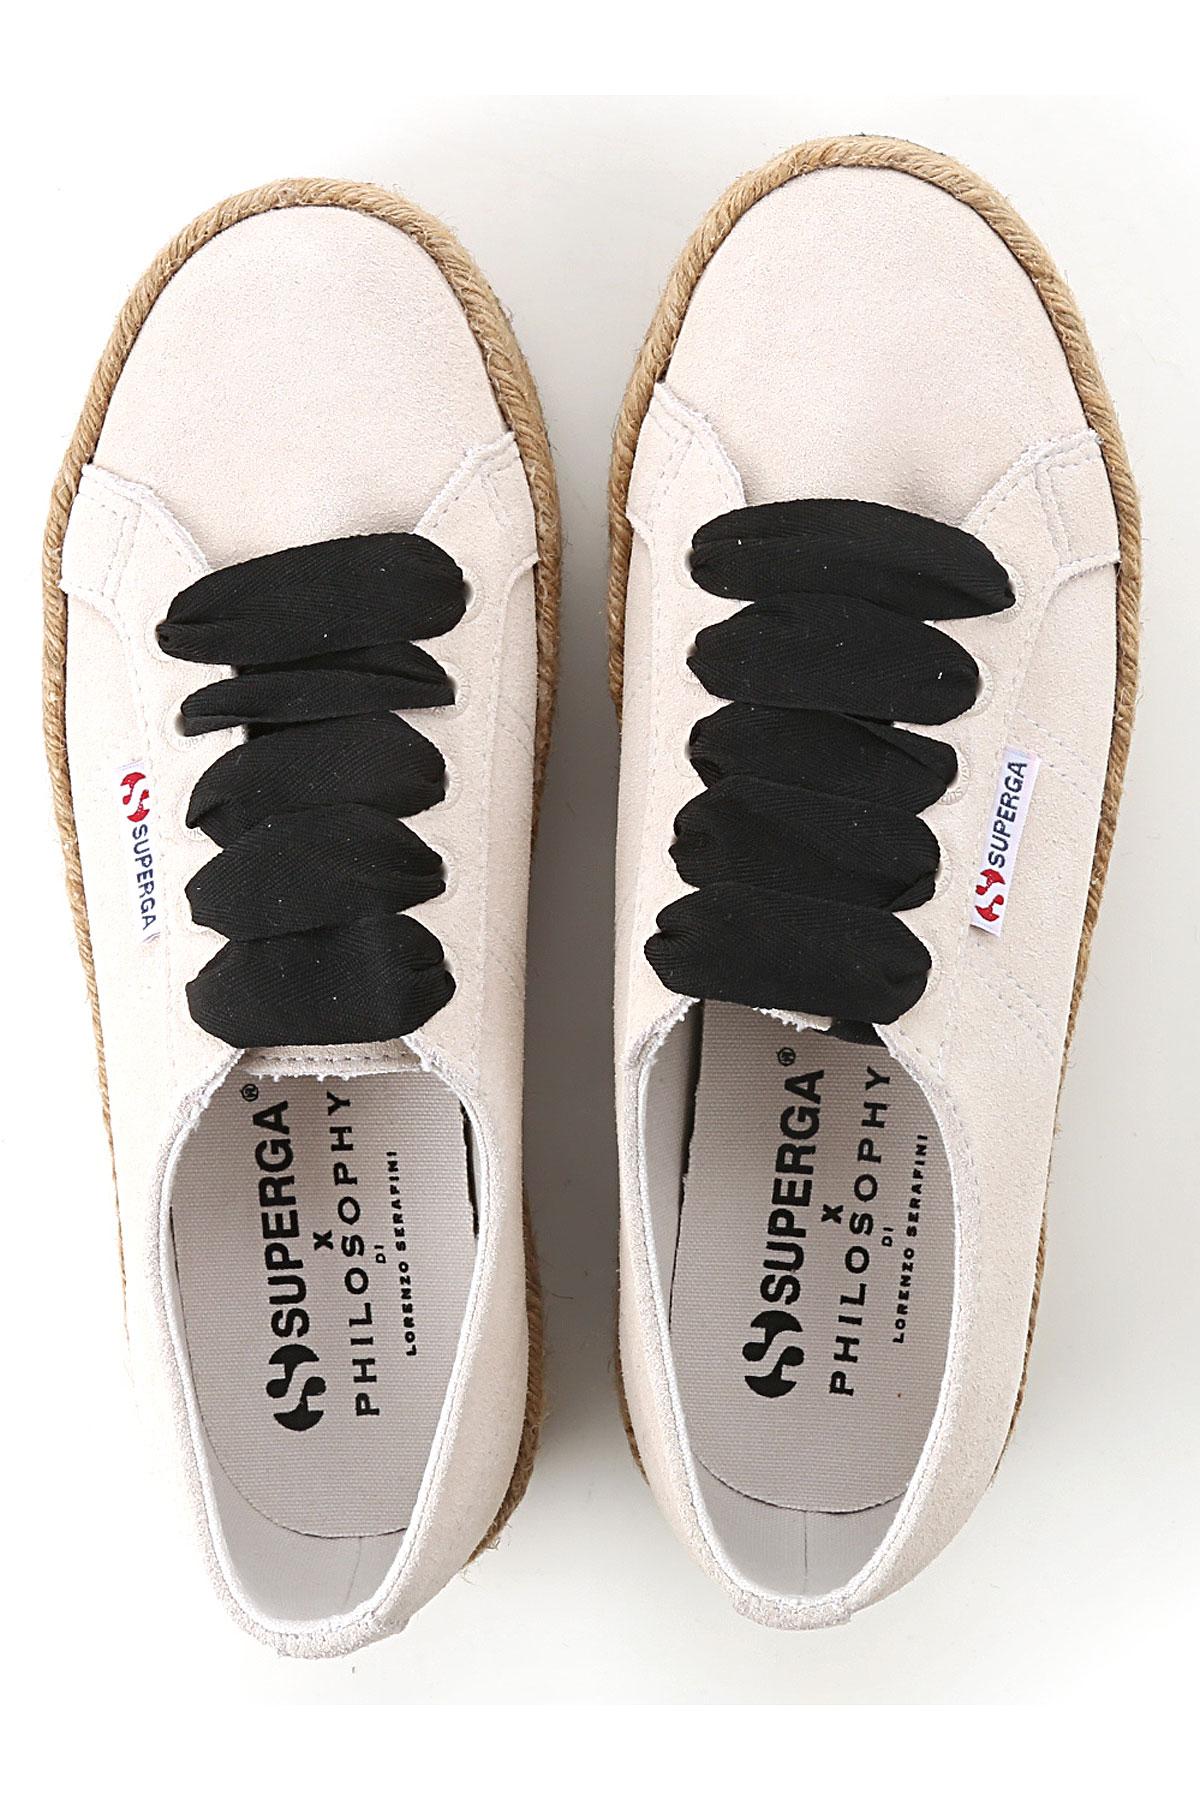 Mujer Para verano nbsp;negro Marfil Zapatos 2019 Soga Primavera Superga 7zHSSw